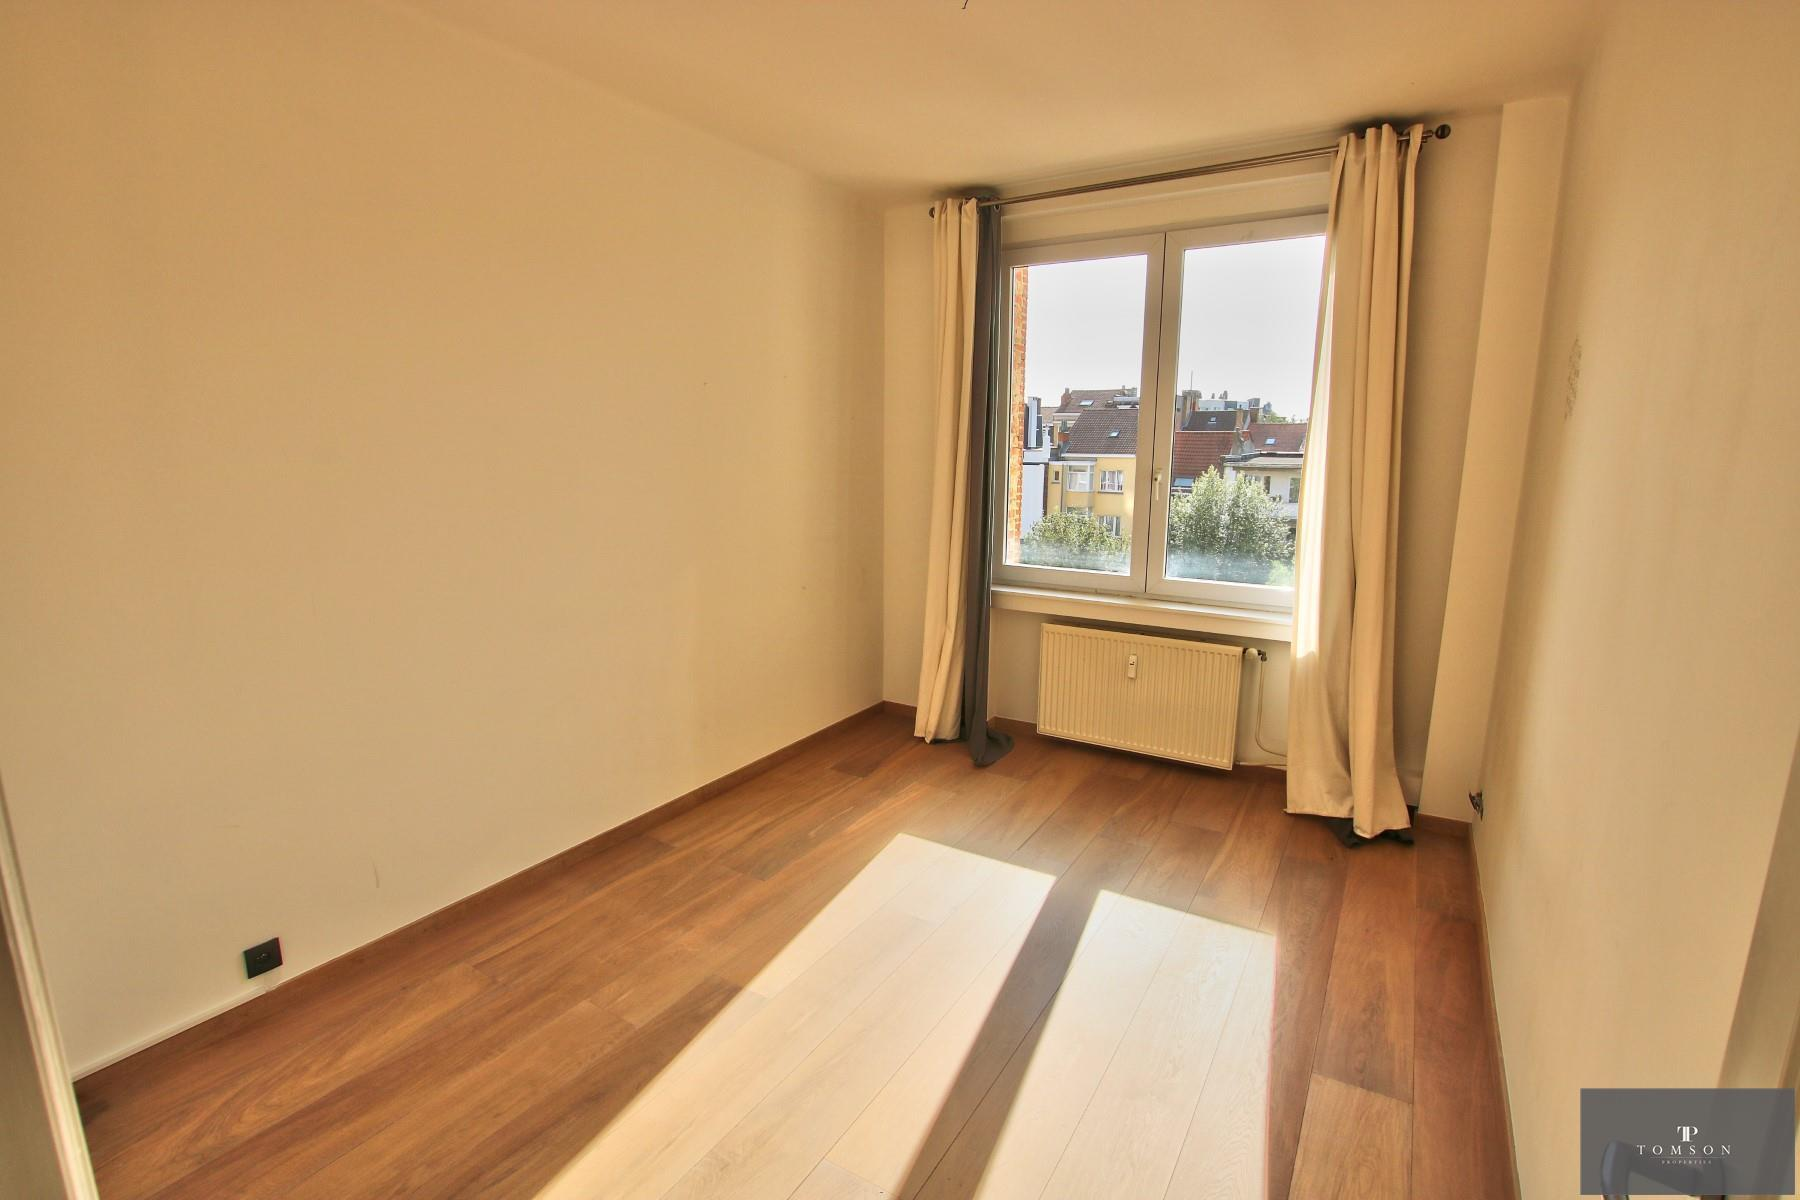 Flat - Etterbeek - #4154759-9